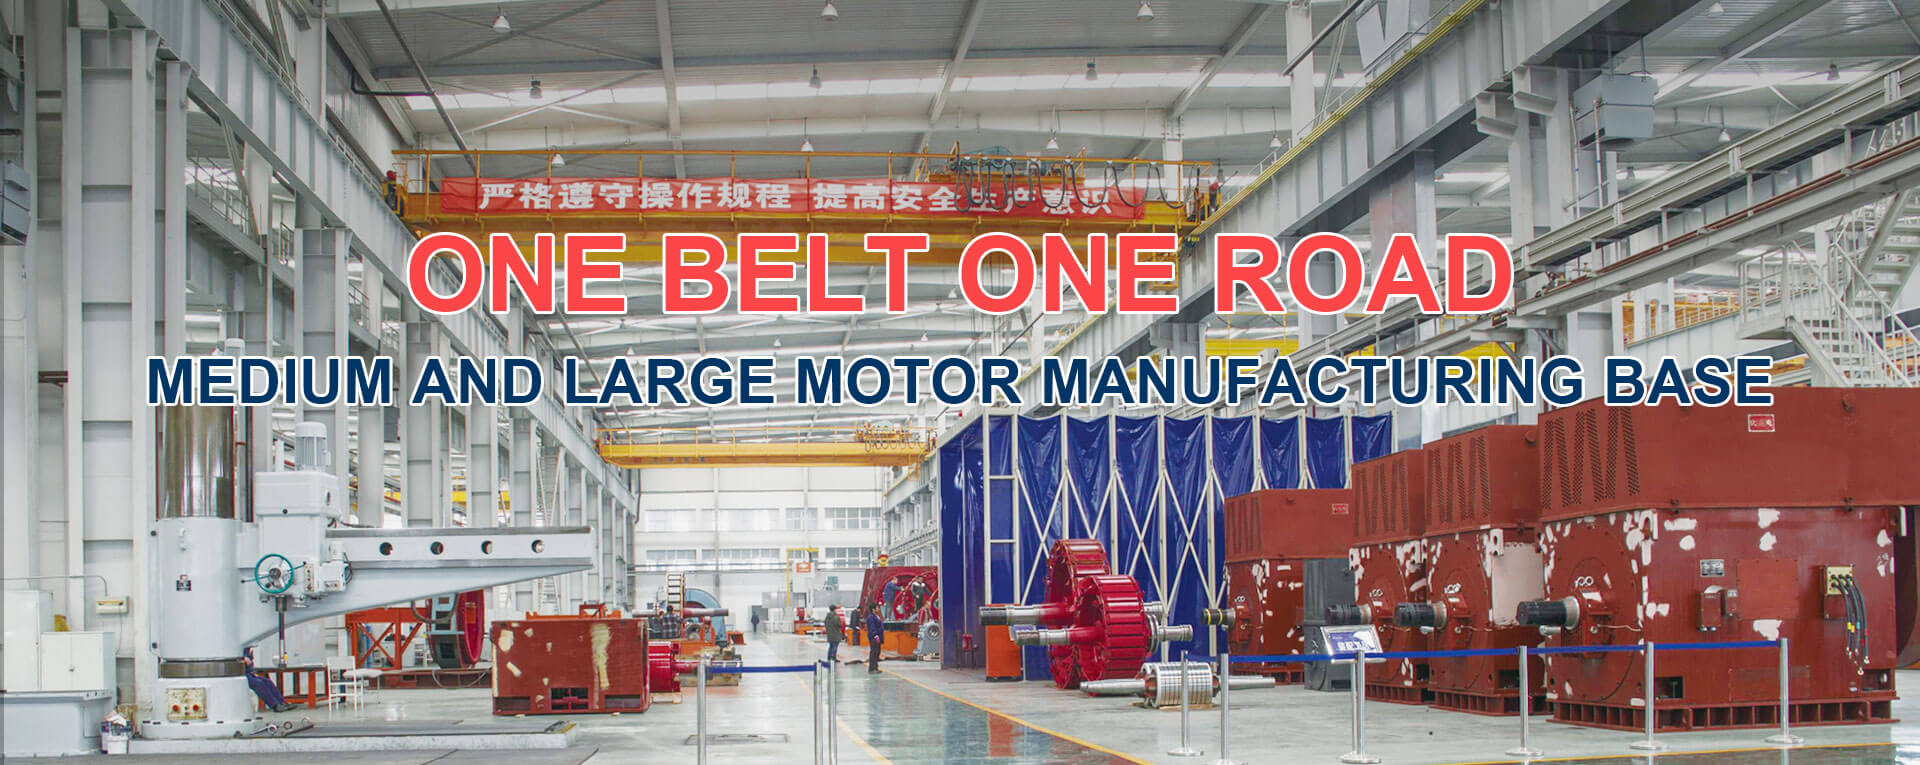 Medium and Large Motor Manufacturing Base